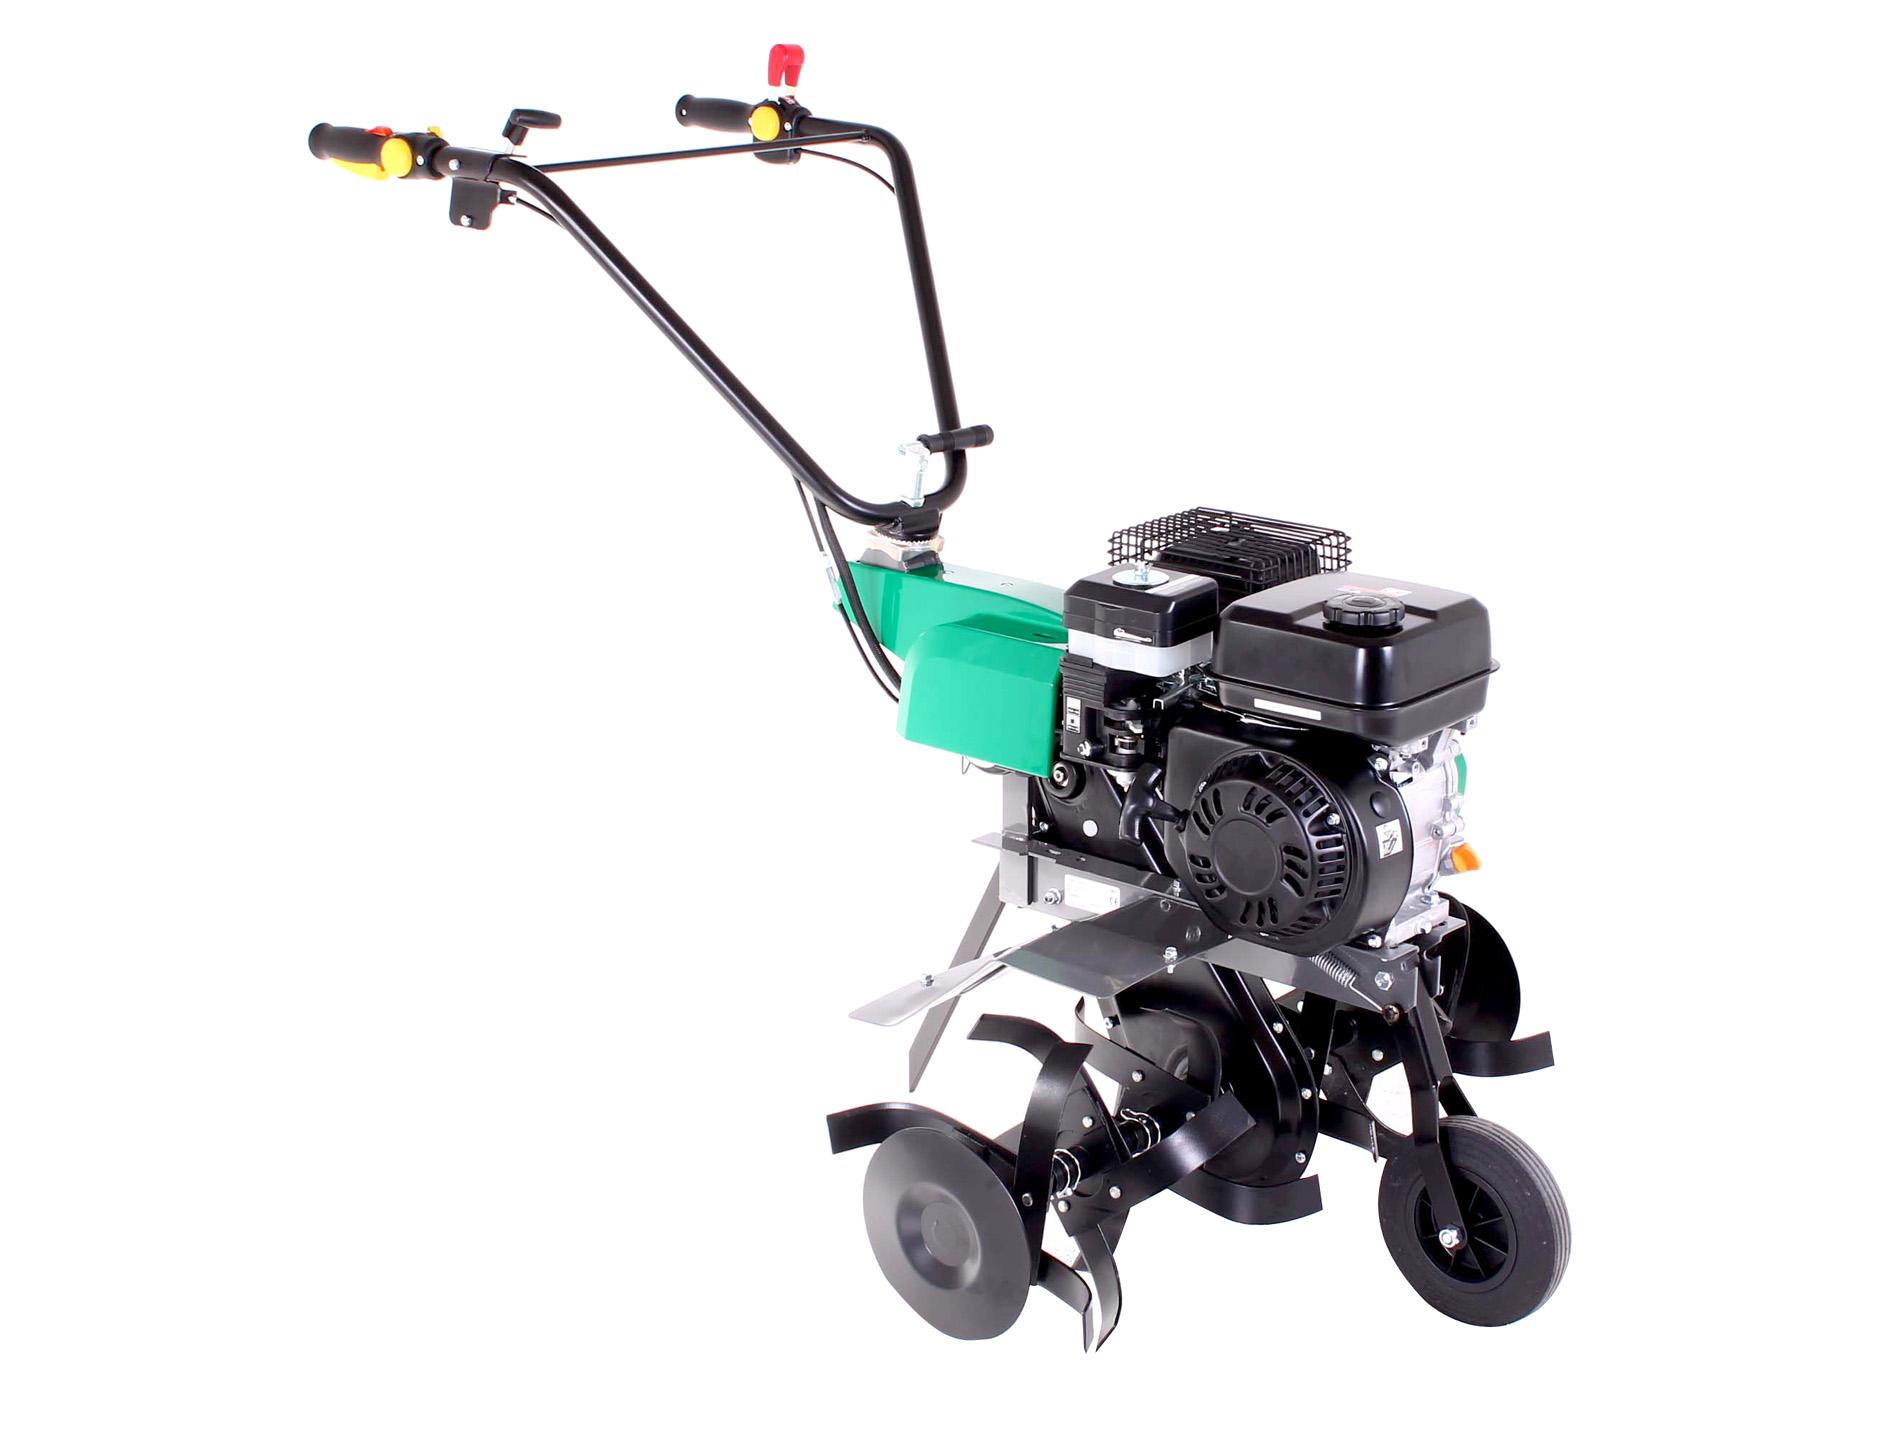 motobineuse thermique mb 210p 212cc motobineuse motoculteur motobineuse tondeuses. Black Bedroom Furniture Sets. Home Design Ideas